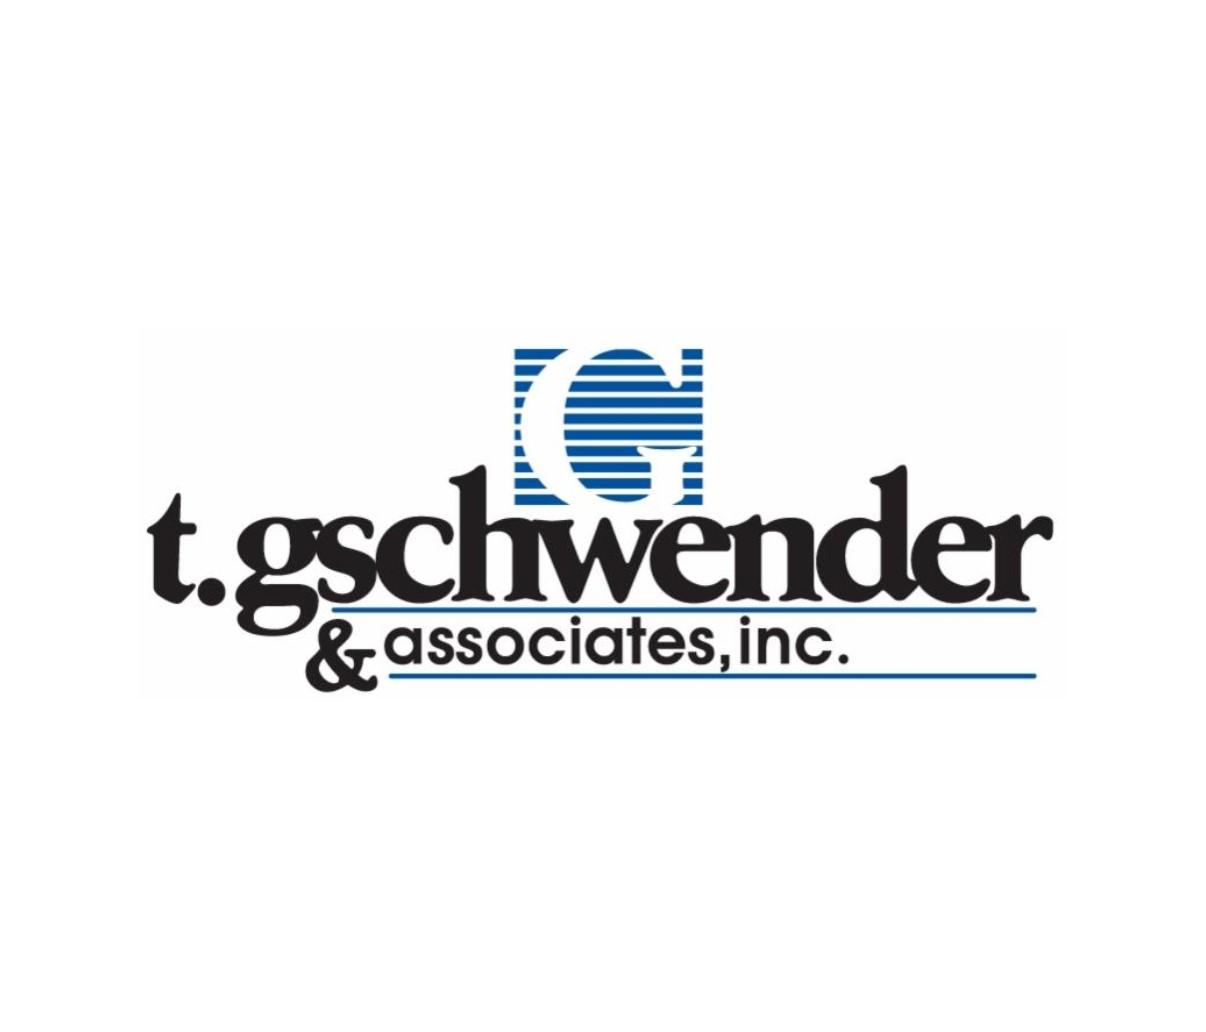 TGschwender-Logo-ConventionSponsor-Reel